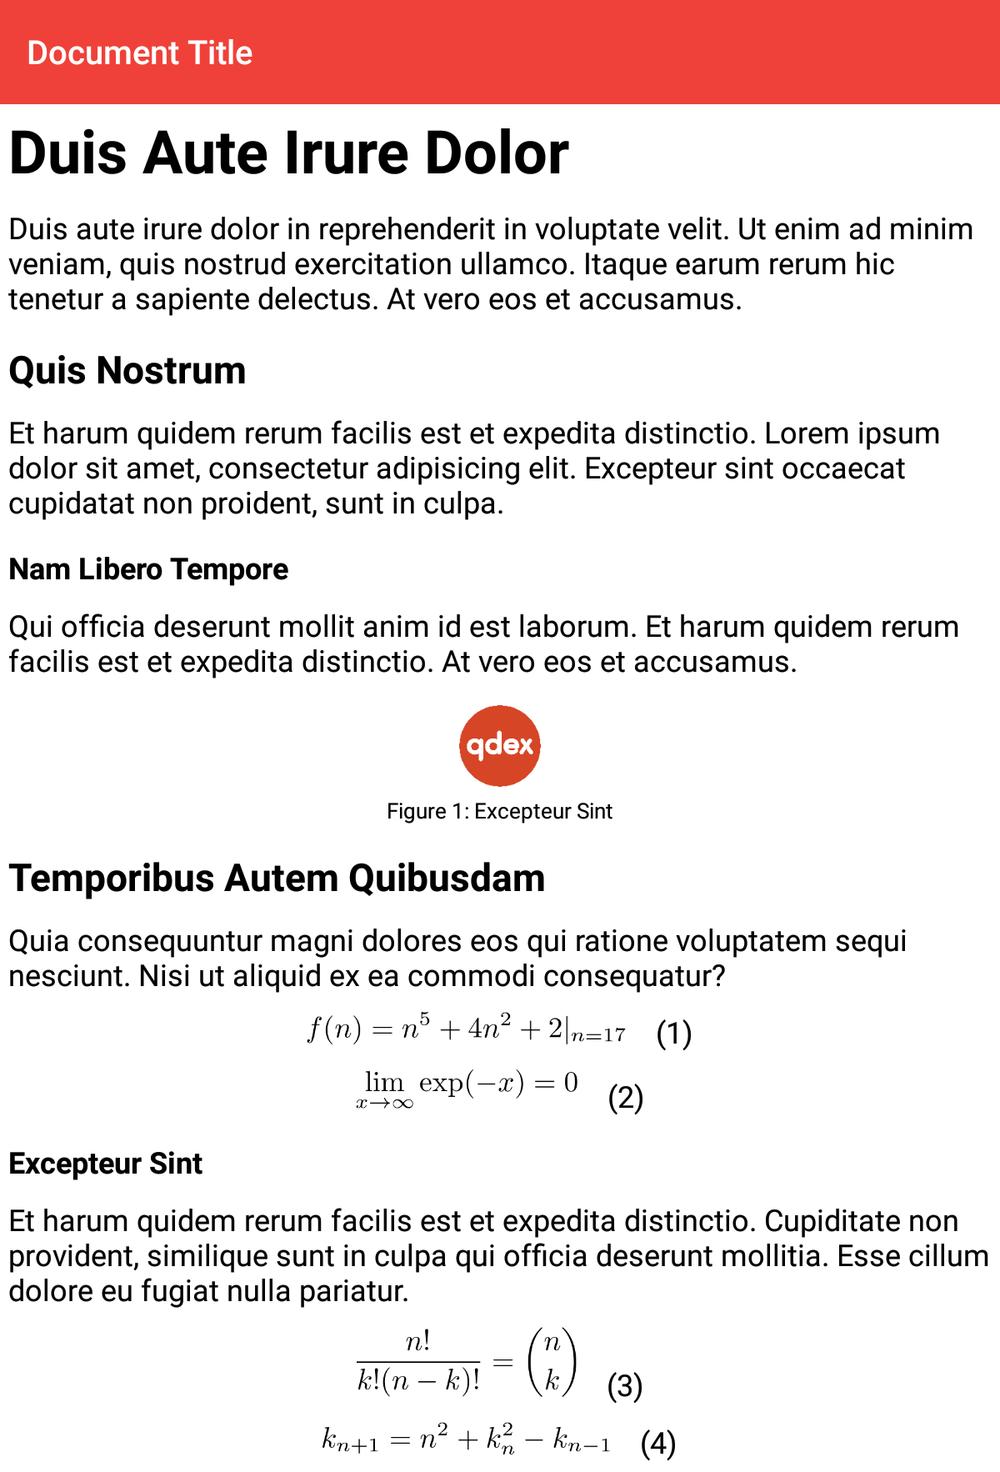 core:simple